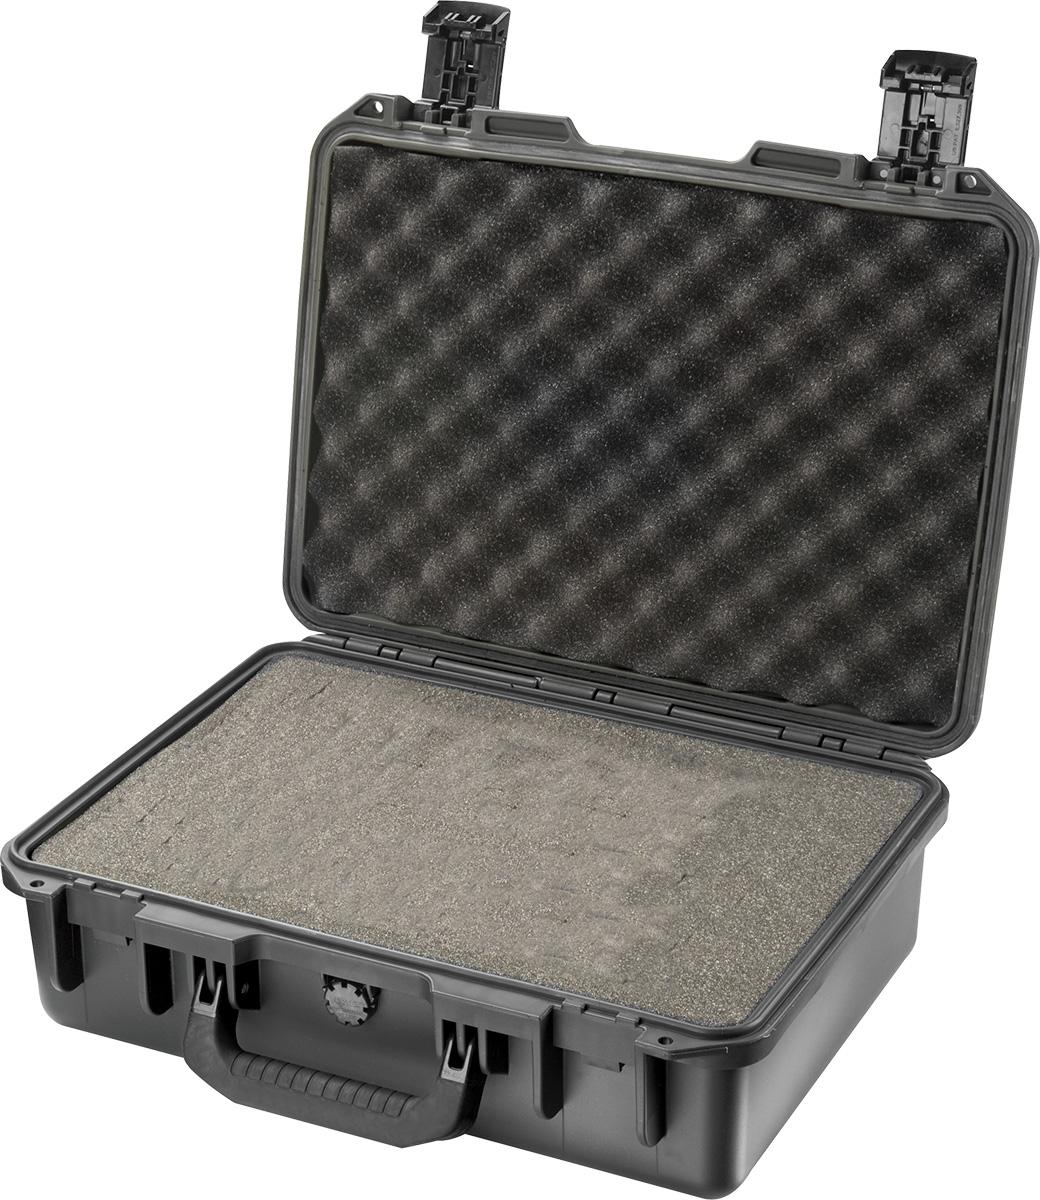 pelican peli im2300 storm hard case padded